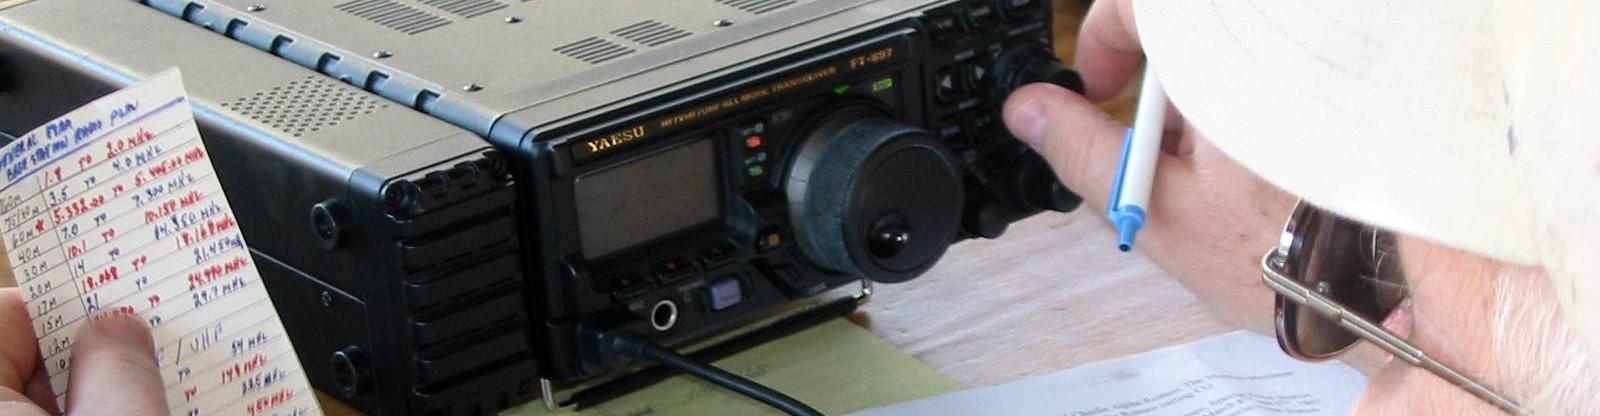 Chesapeake Amateur Radio Service